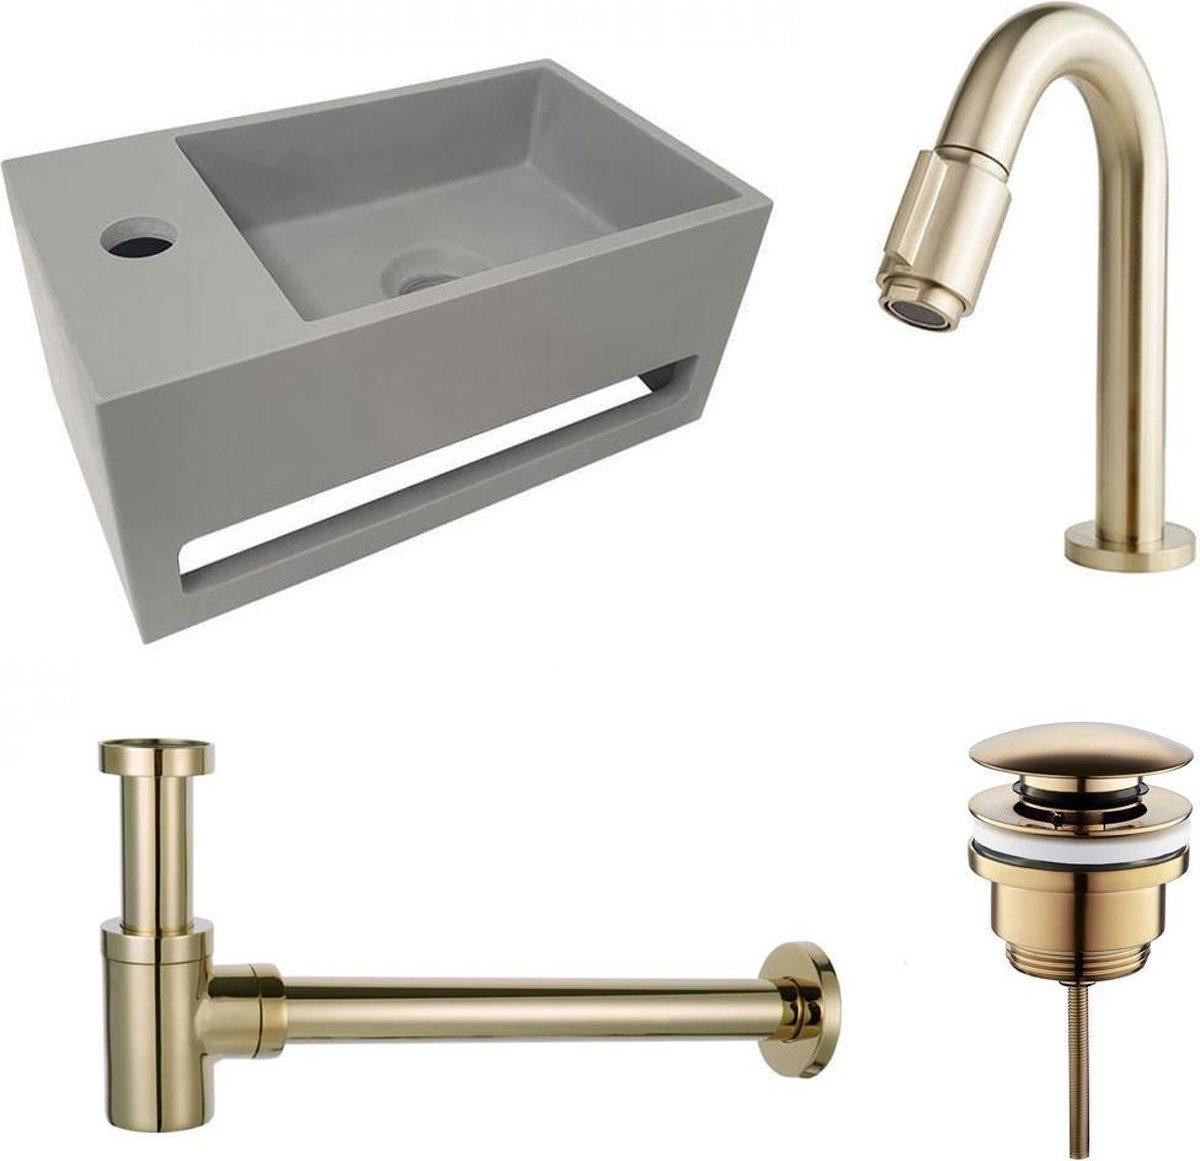 Fonteinset S.S. Solid Surface Links 35.6x20.3x15.9cm Toiletkraan Knop Clickwaste Sifon Geborsteld Goud/Betonlook